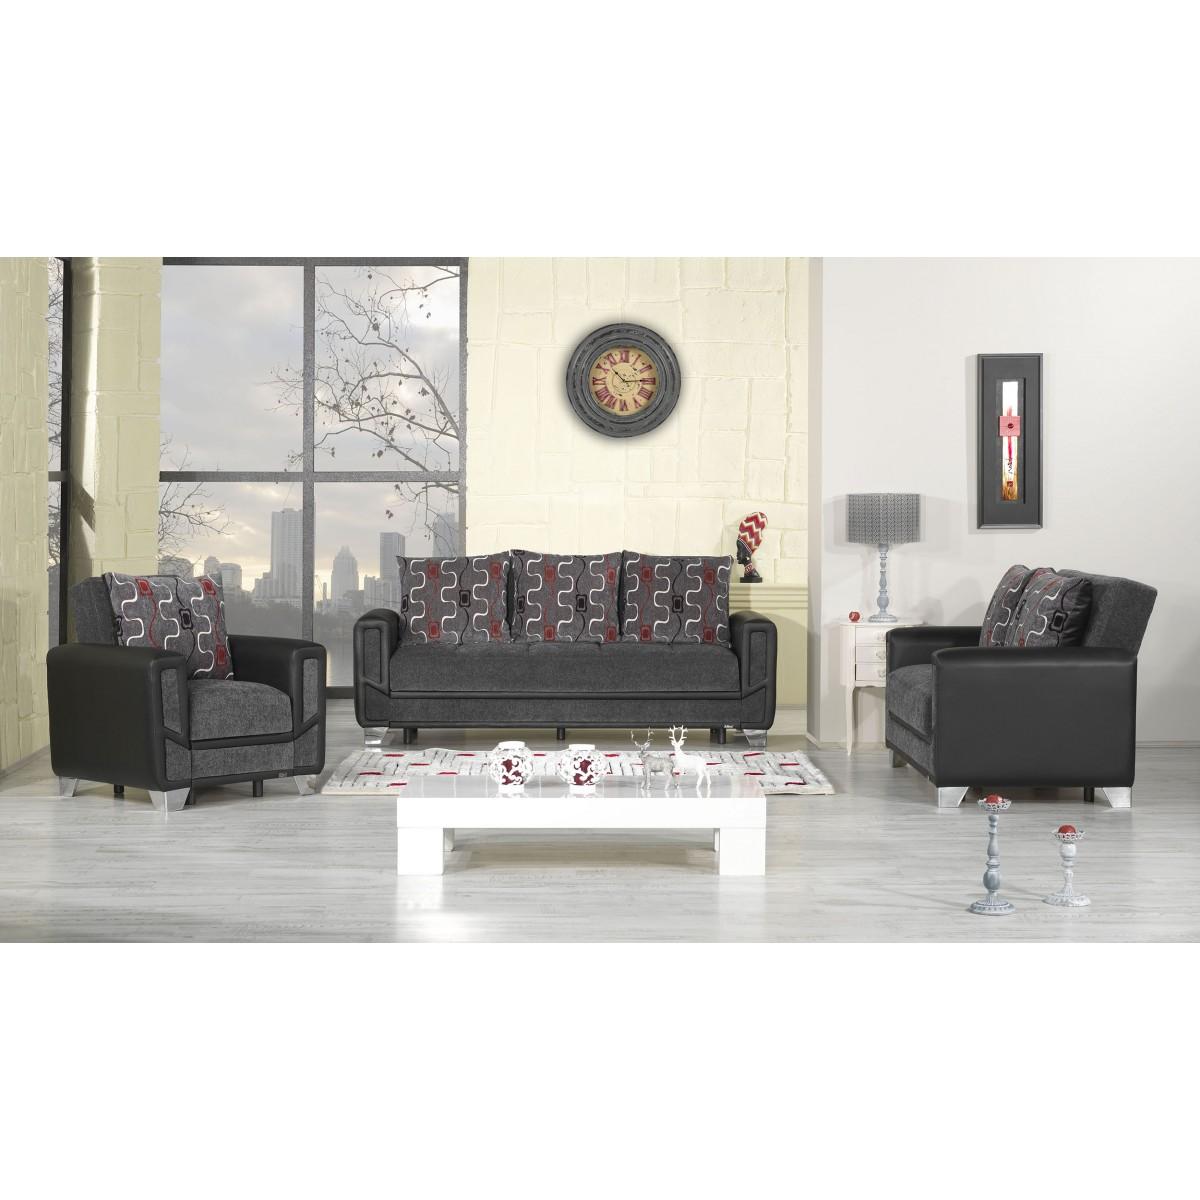 Full Size of Sofa Mondo 1 Agata Meble Group Bertinoro 2 Srl Brick Orari Kaufen Bed Couch Erfahrungen Leder Online Set Kilim Furniture Blaues Barock Mit Hocker Schillig Sofa Mondo Sofa